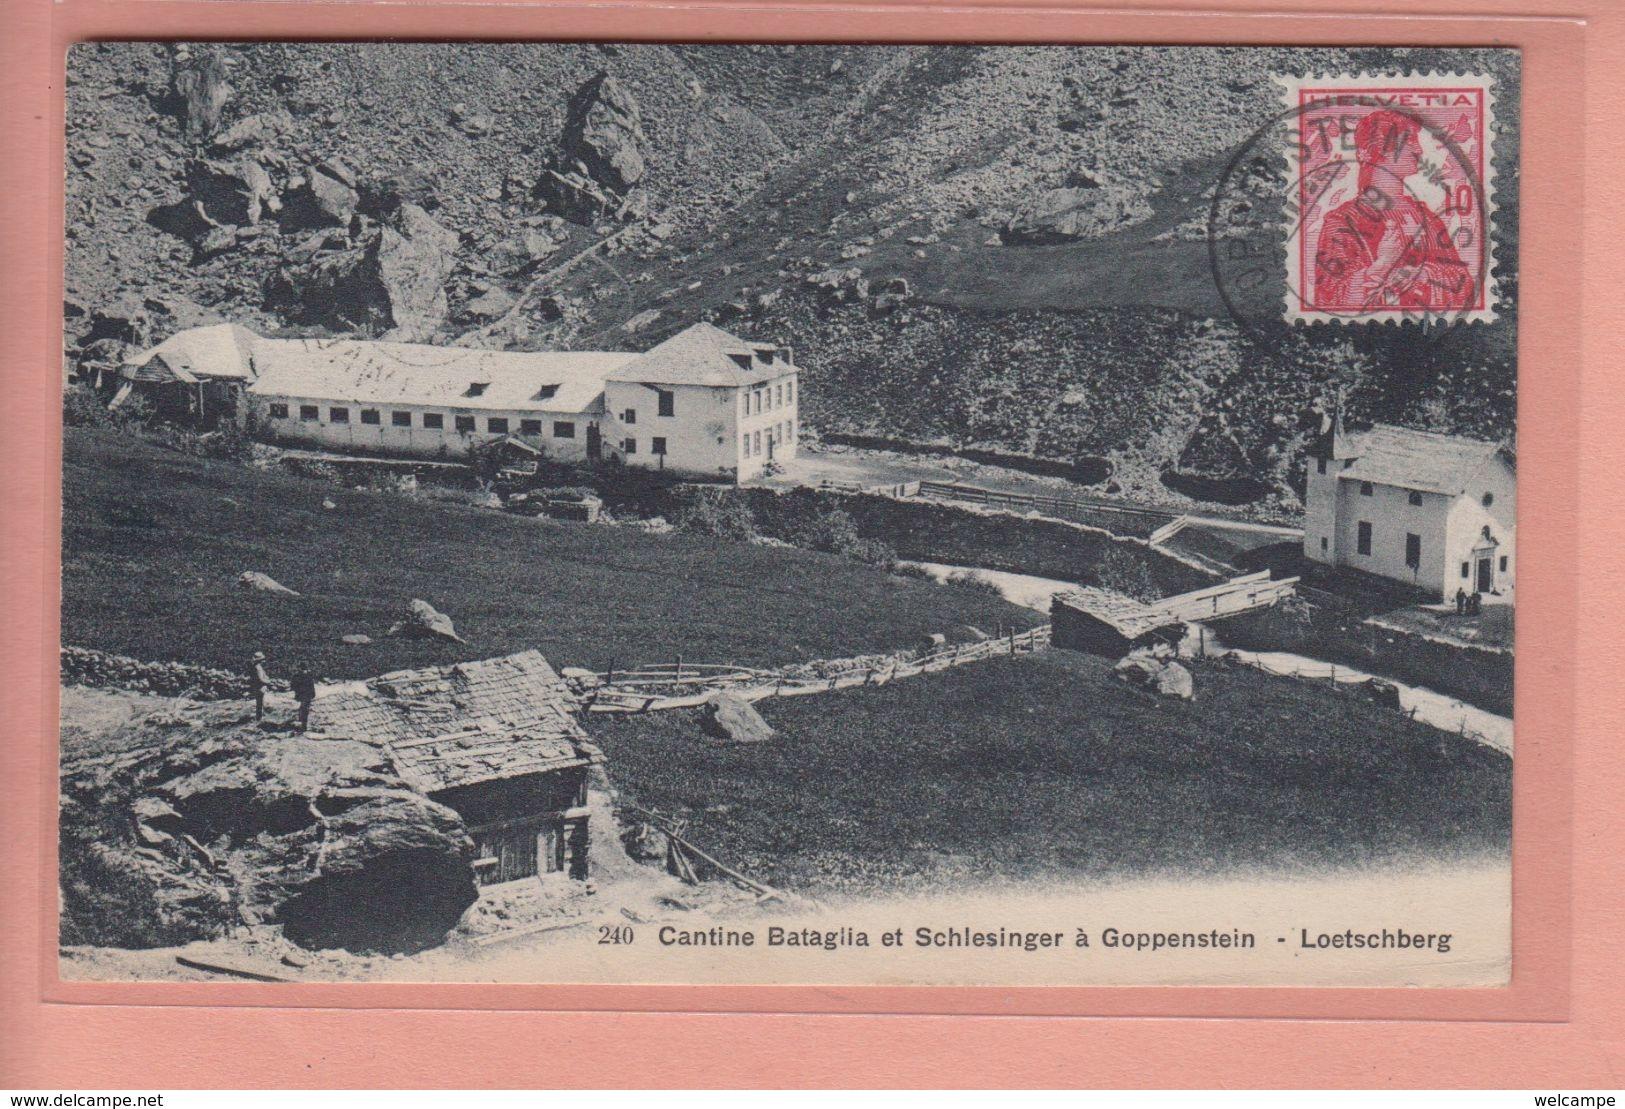 OUDE POSTKAART ZWITSERLAND  -  SCHWEIZ - SUISSE -    CANTINE BATAGLIA GOPPENSTEIN - LOETSCHBERG  1909 - VS Valais